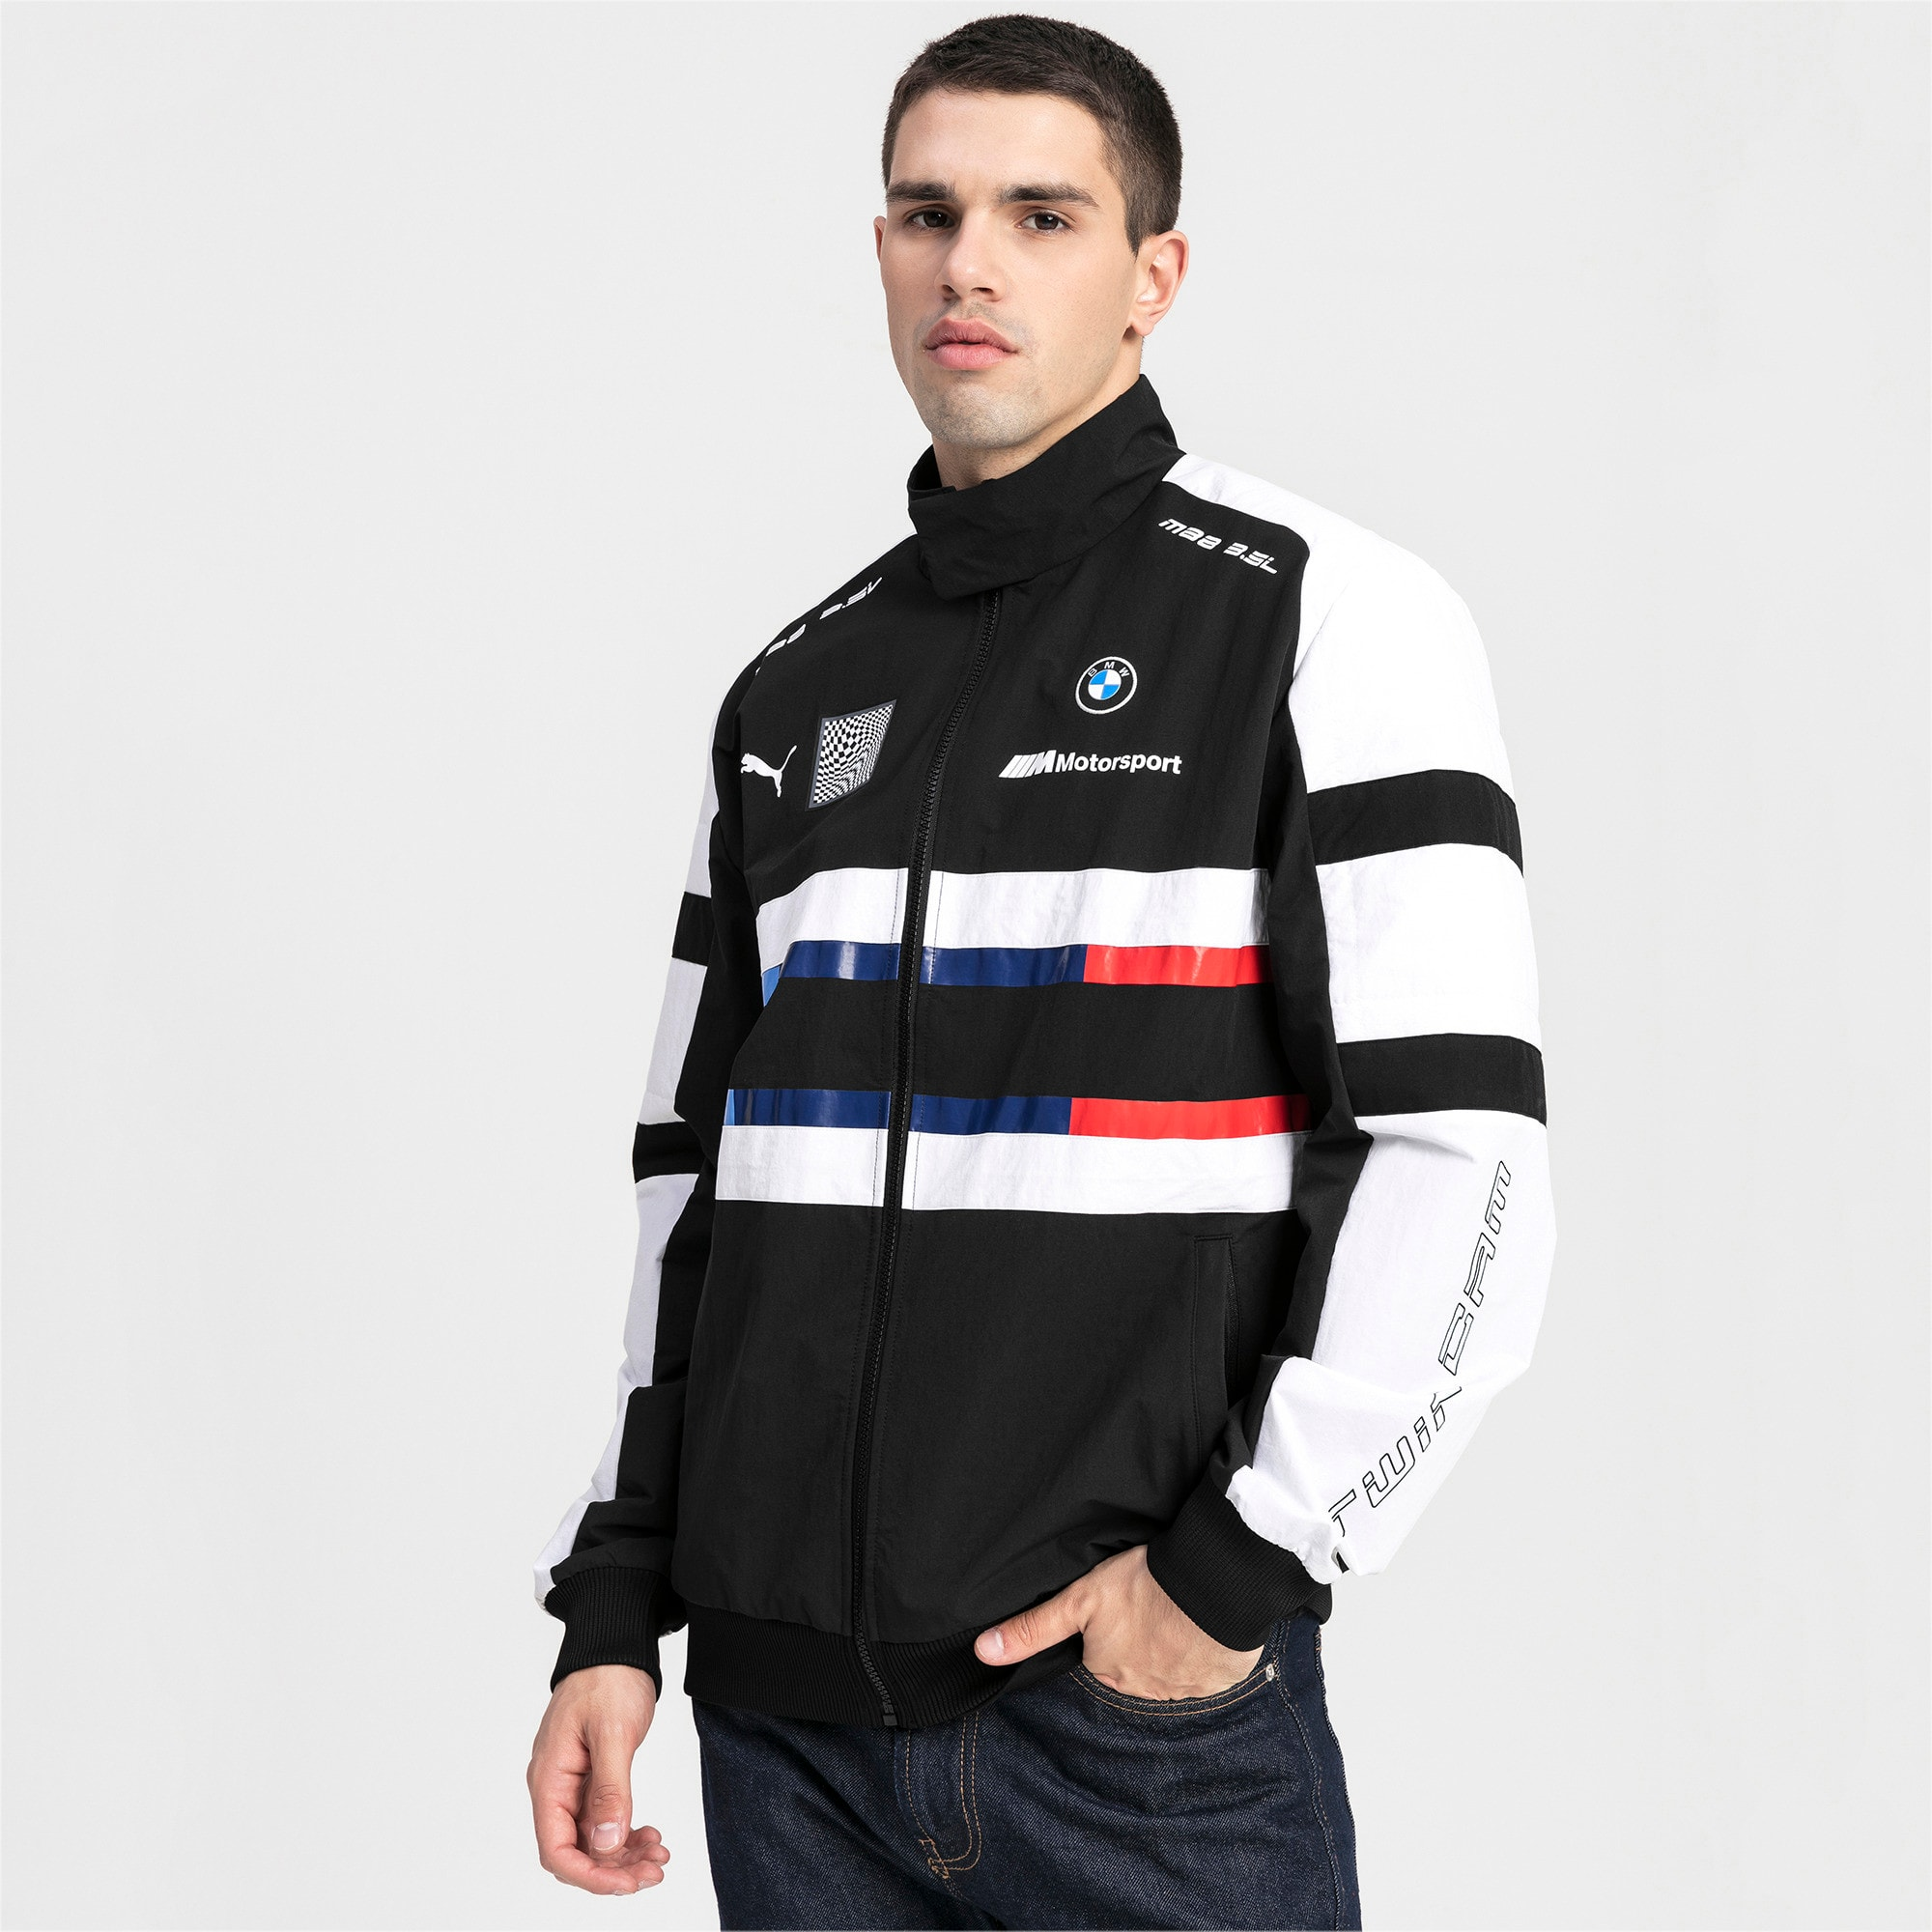 Thumbnail 1 of BMW Motorsport Street Woven Men's Jacket, Puma Black, medium